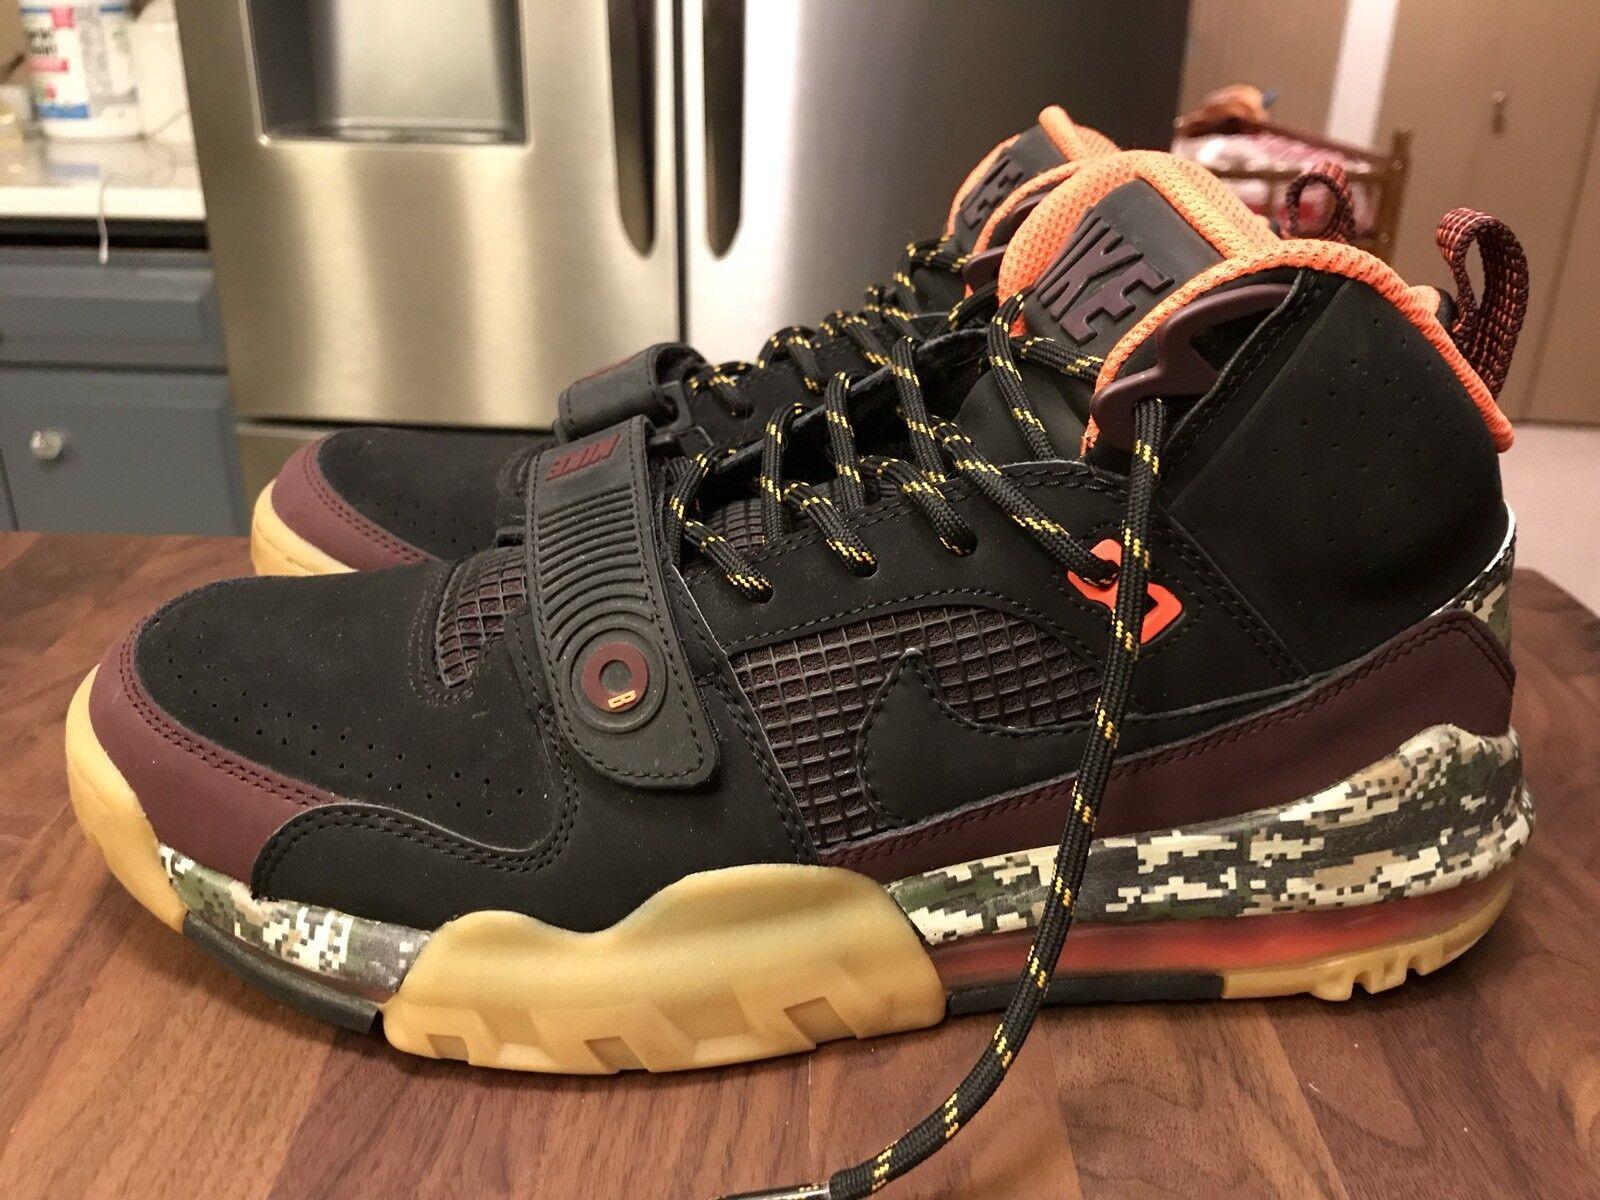 Nike Air Max Bo Jackson Digital Camo 654479-001 Size 9 - NICE!!!